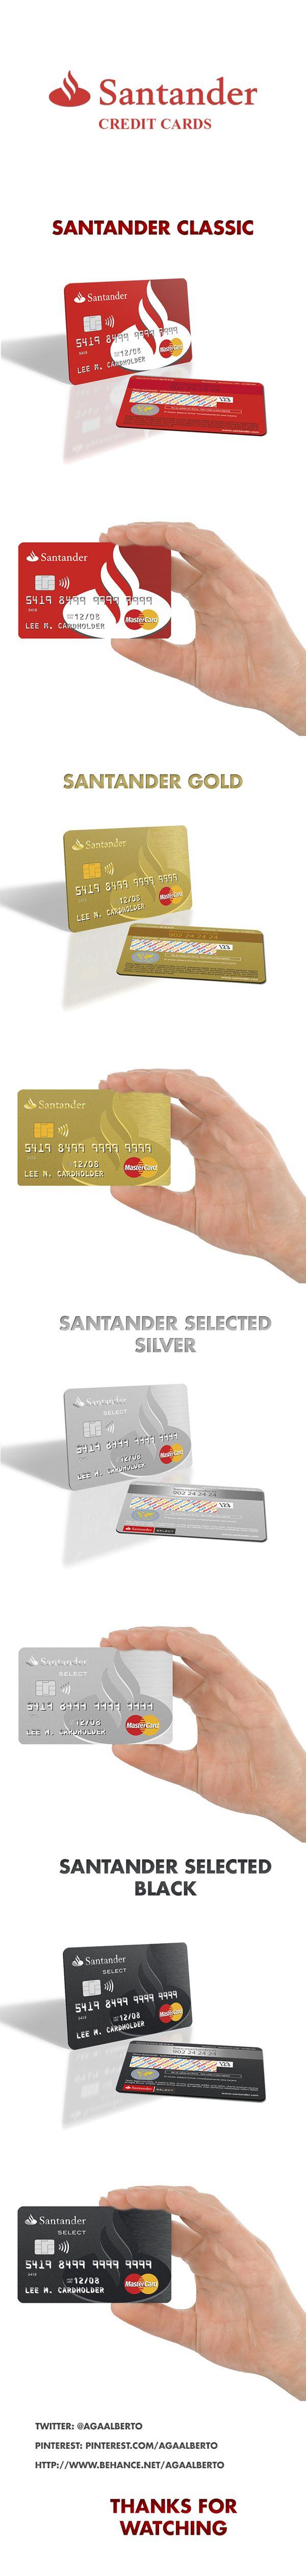 Santander Credits Cards Cards Credit Card Graphic Design